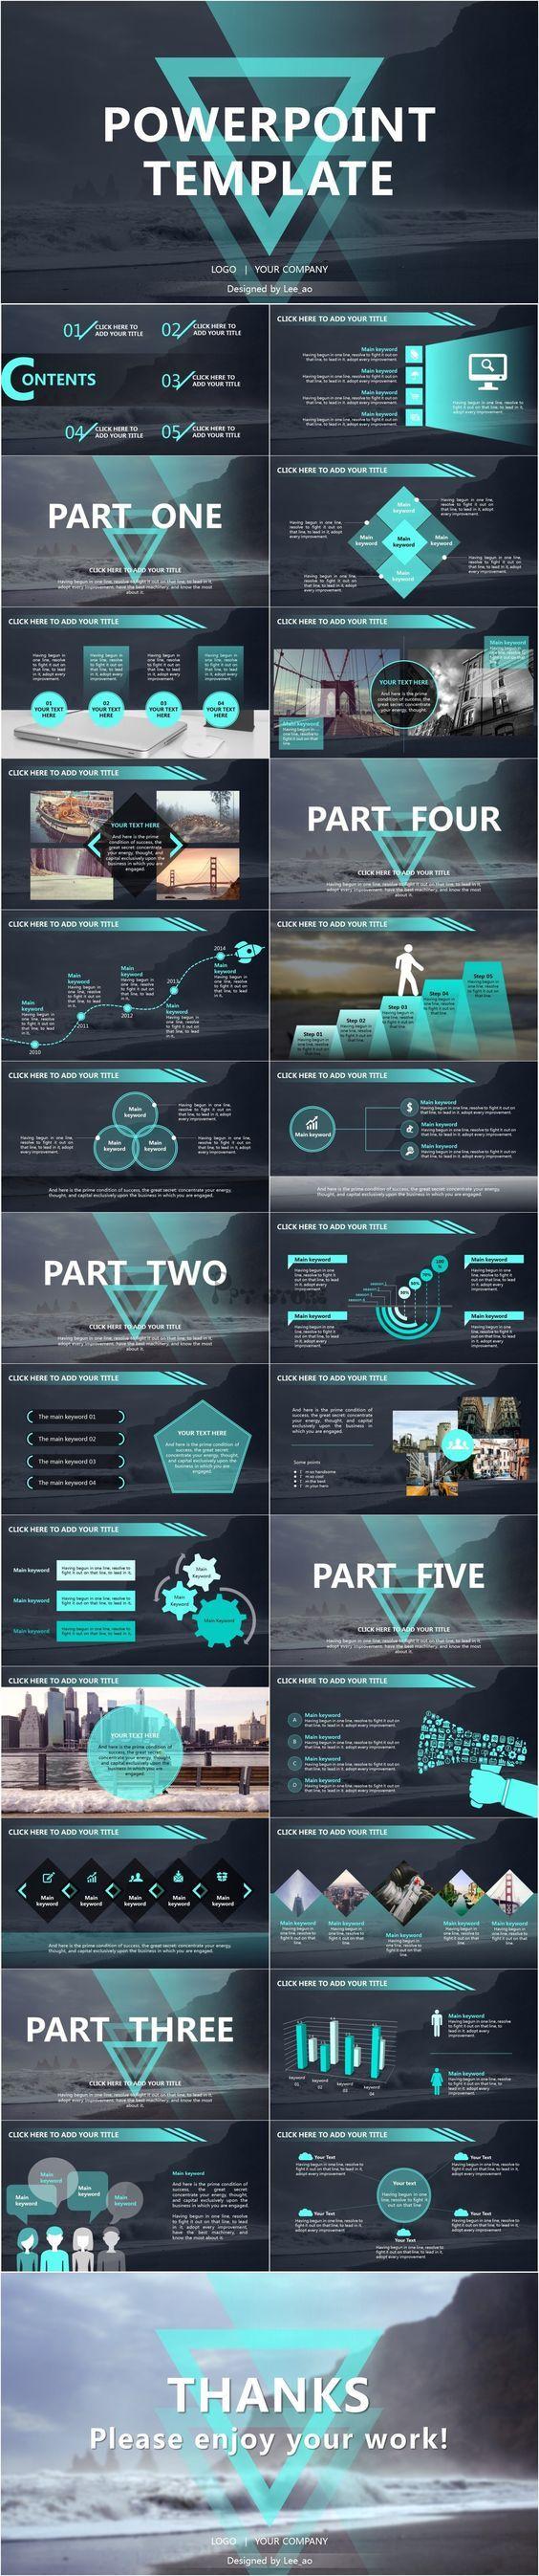 PowerPoint template,download:http://www.pptstore.net/shangwu_ppt/12173.html: